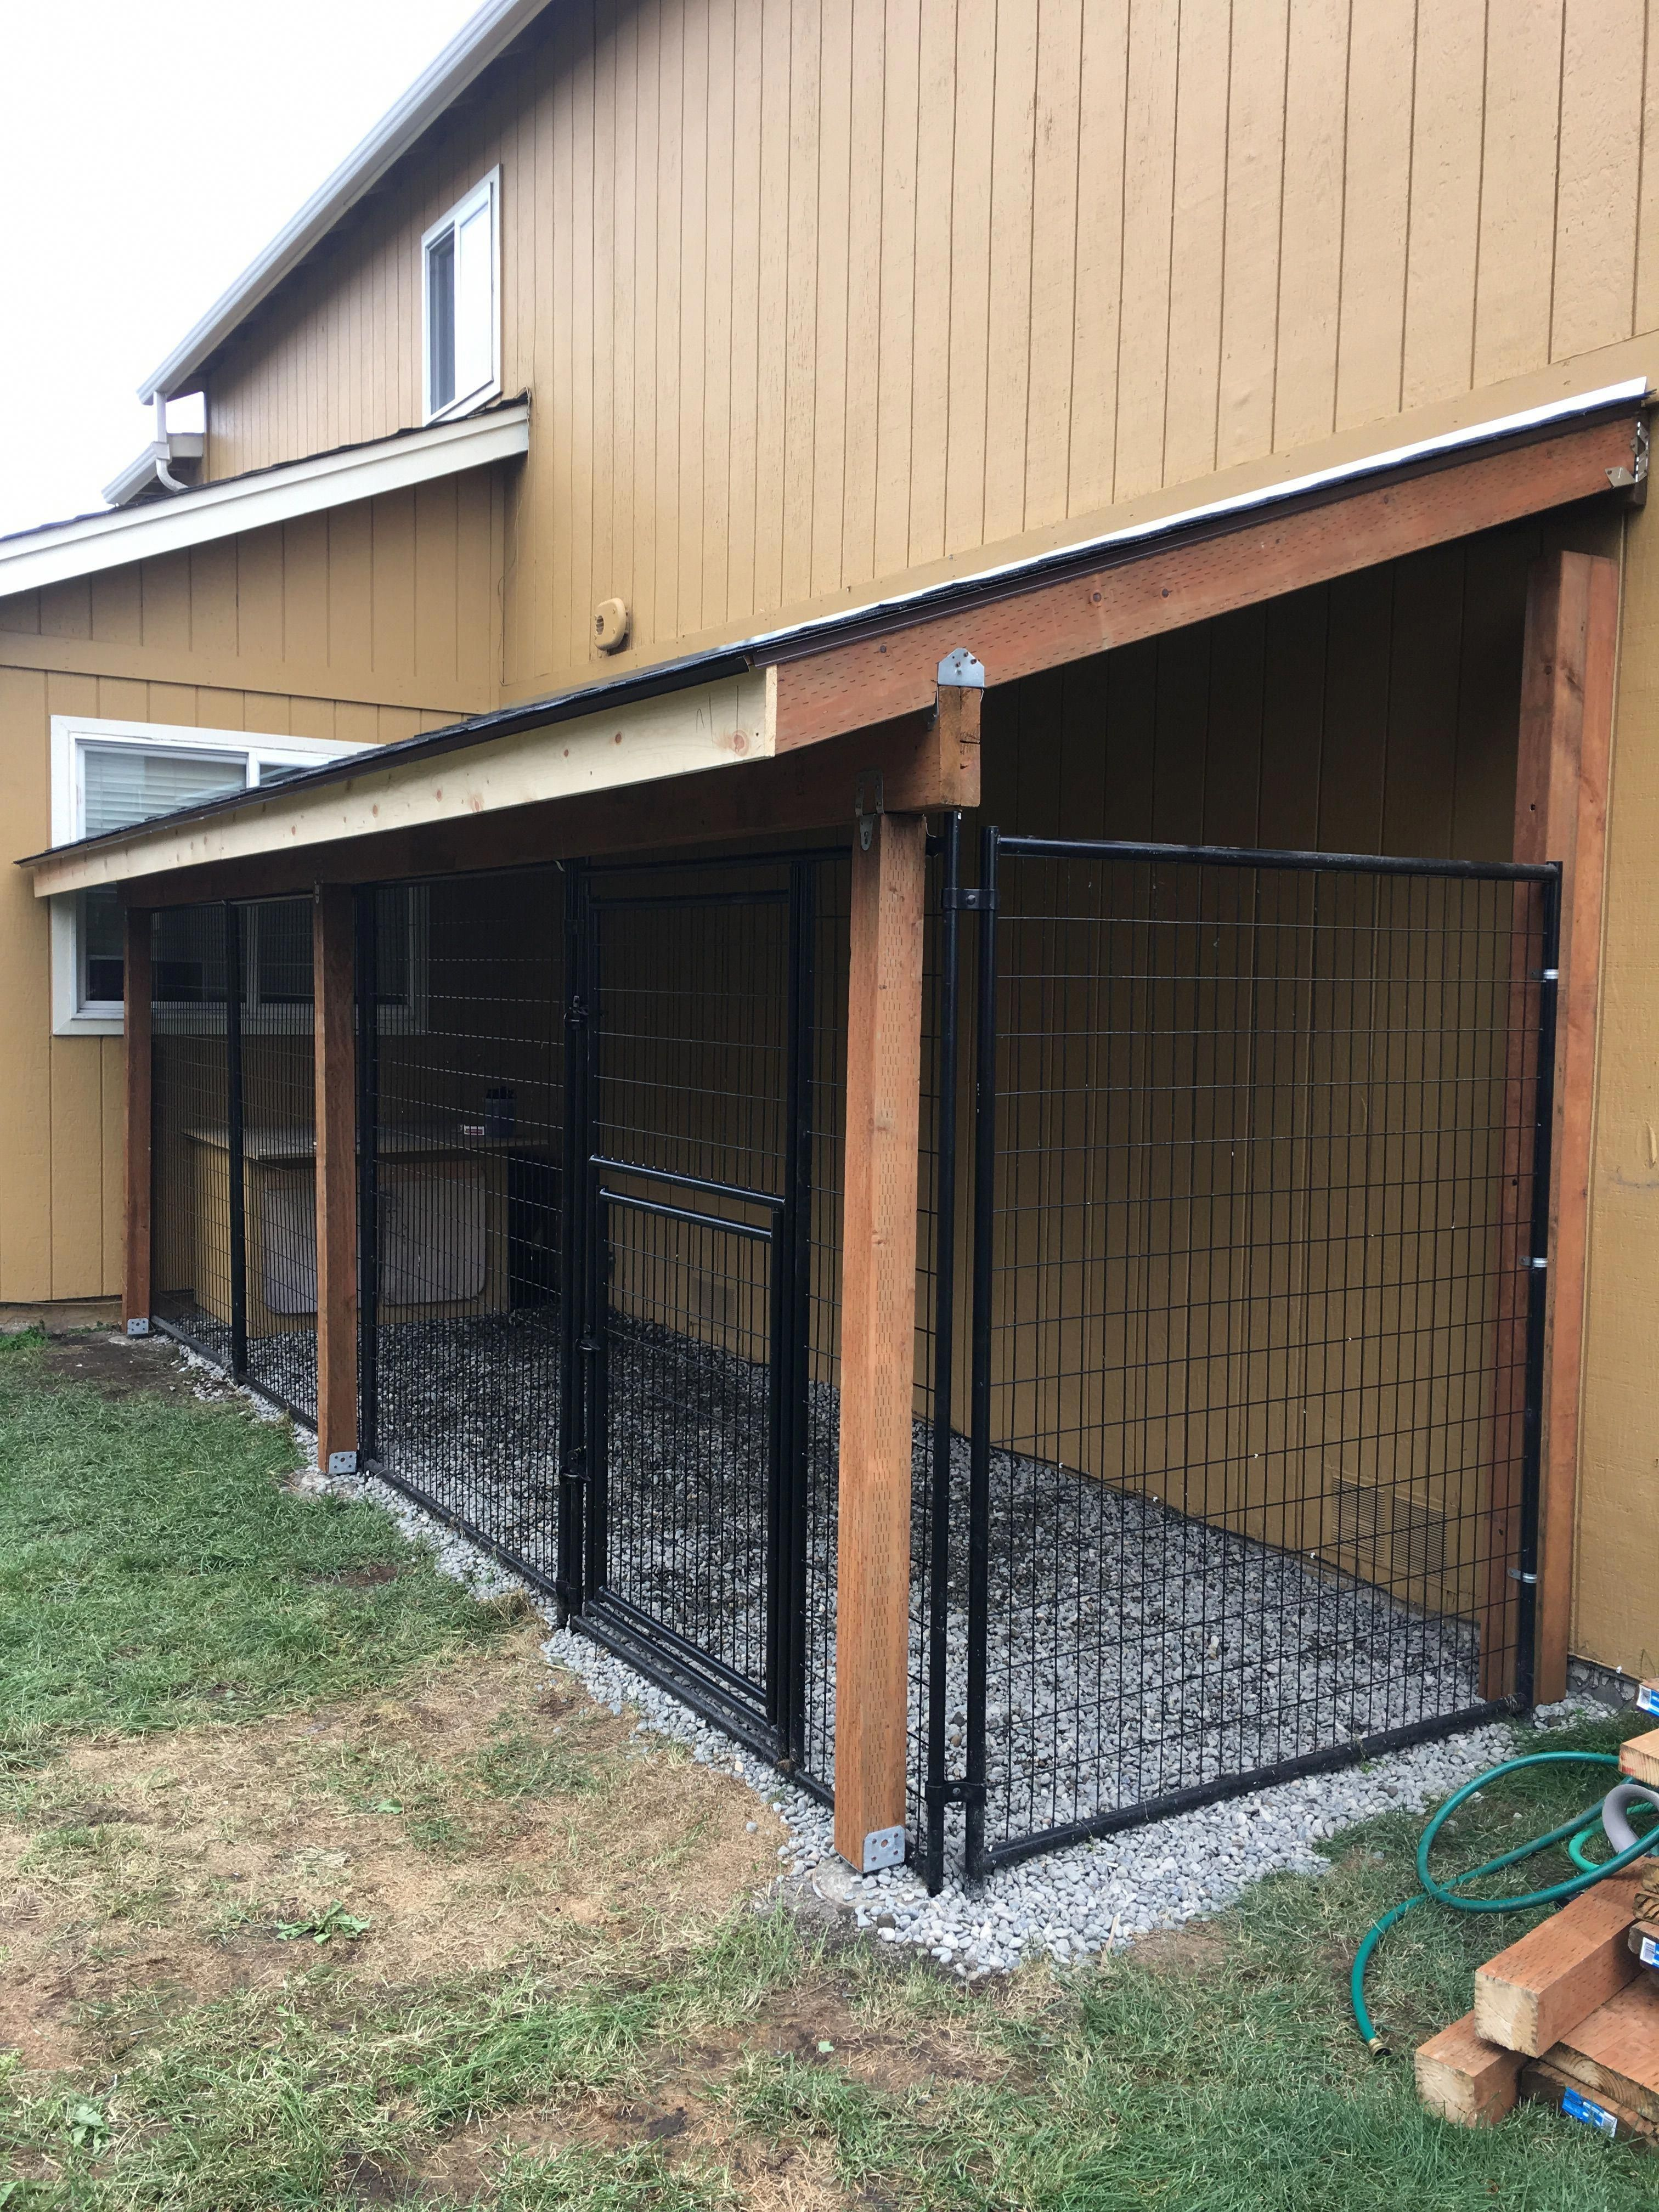 Fortheloveofpets Build A Dog House Building A Dog Kennel Diy Dog Kennel